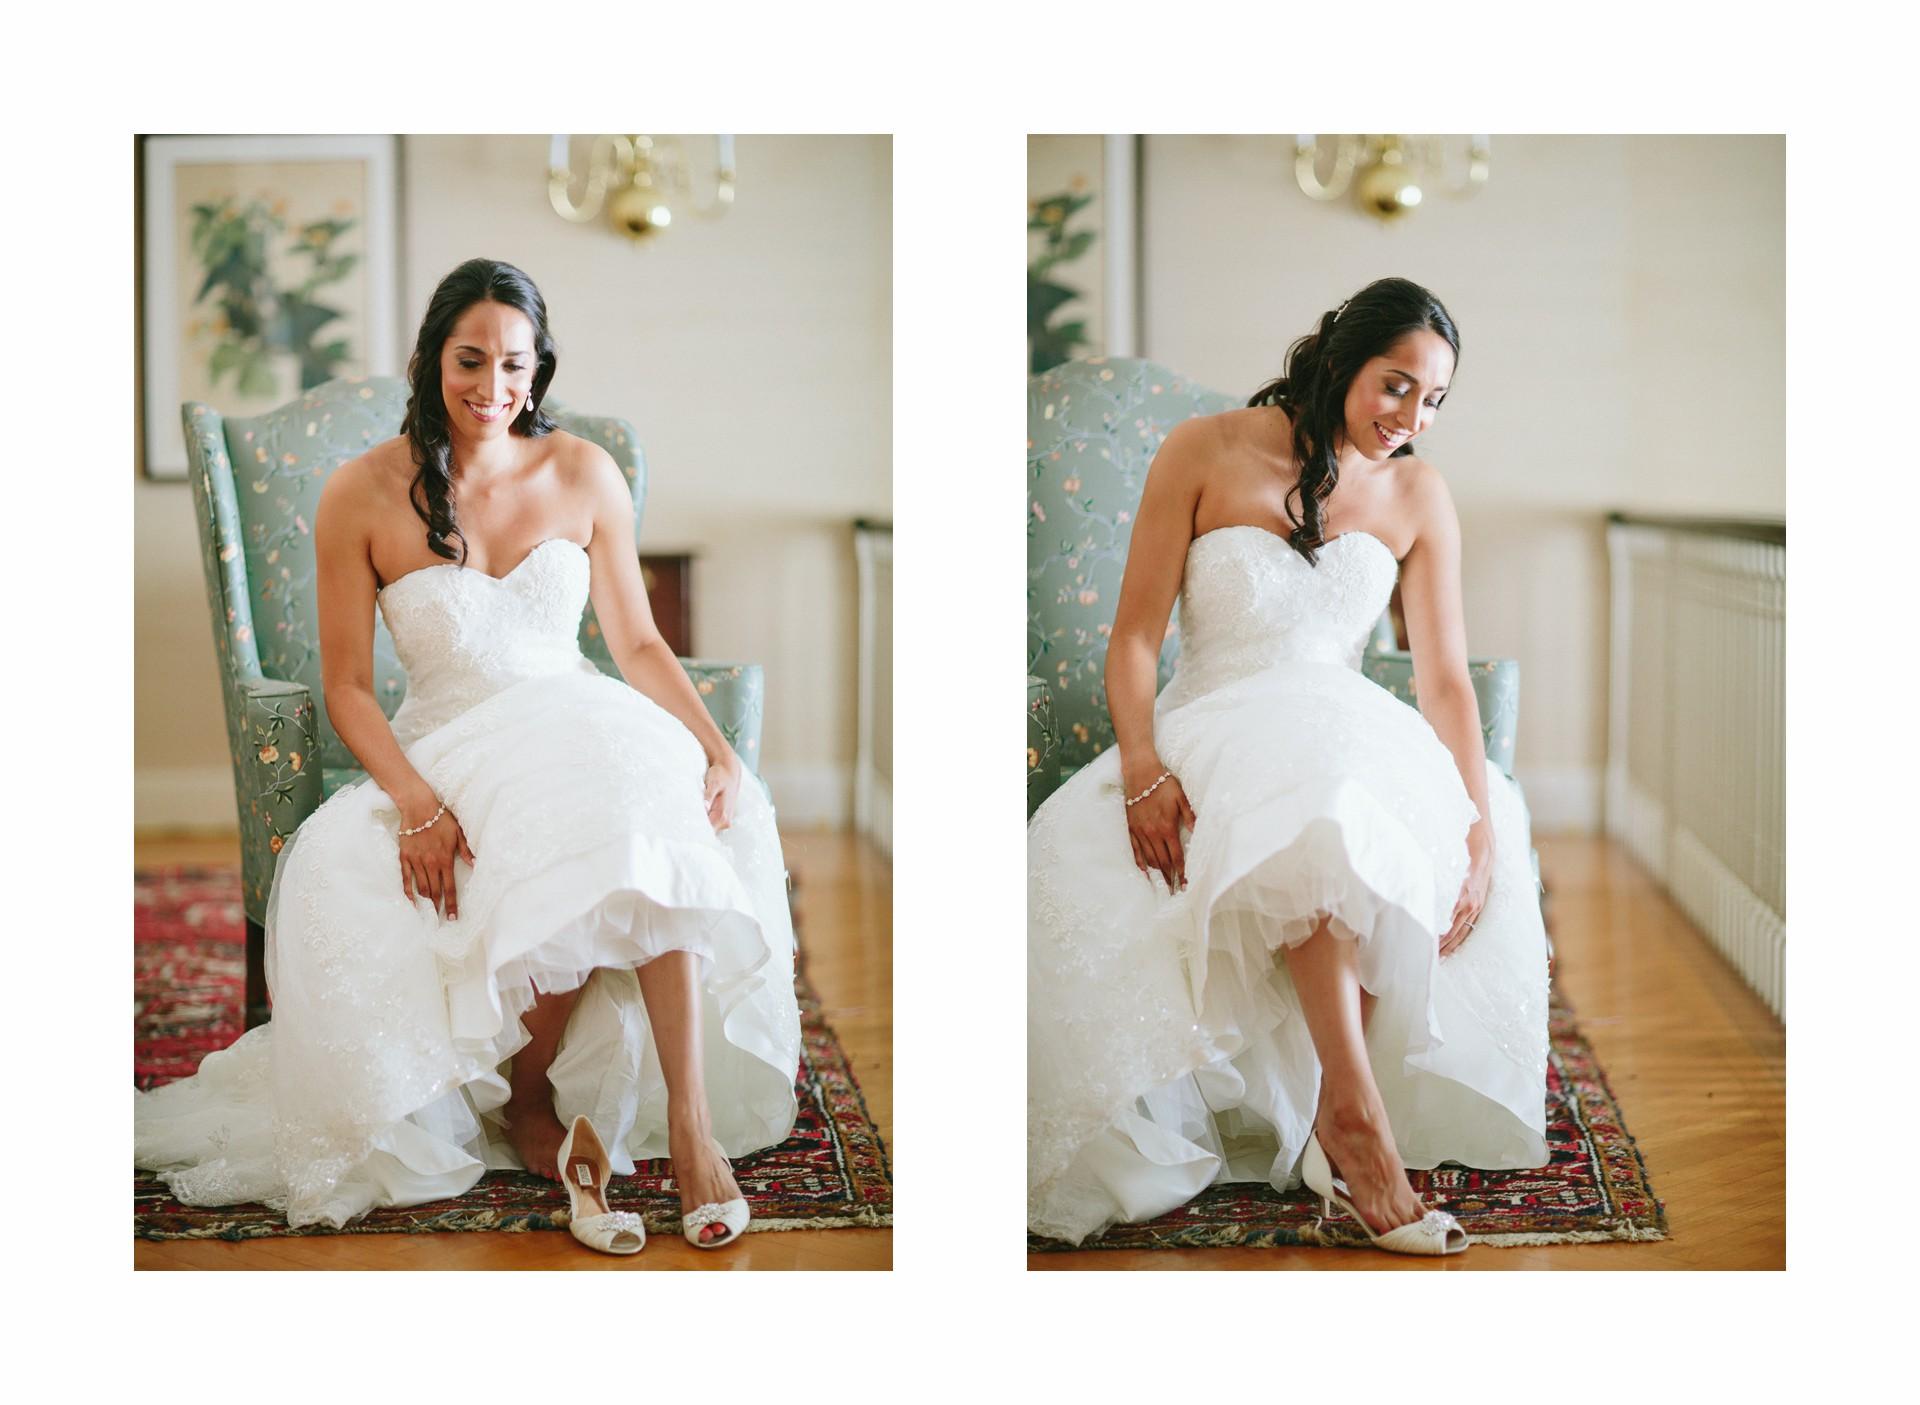 Bolton House Wedding Photographer in Beachwood 13.jpg